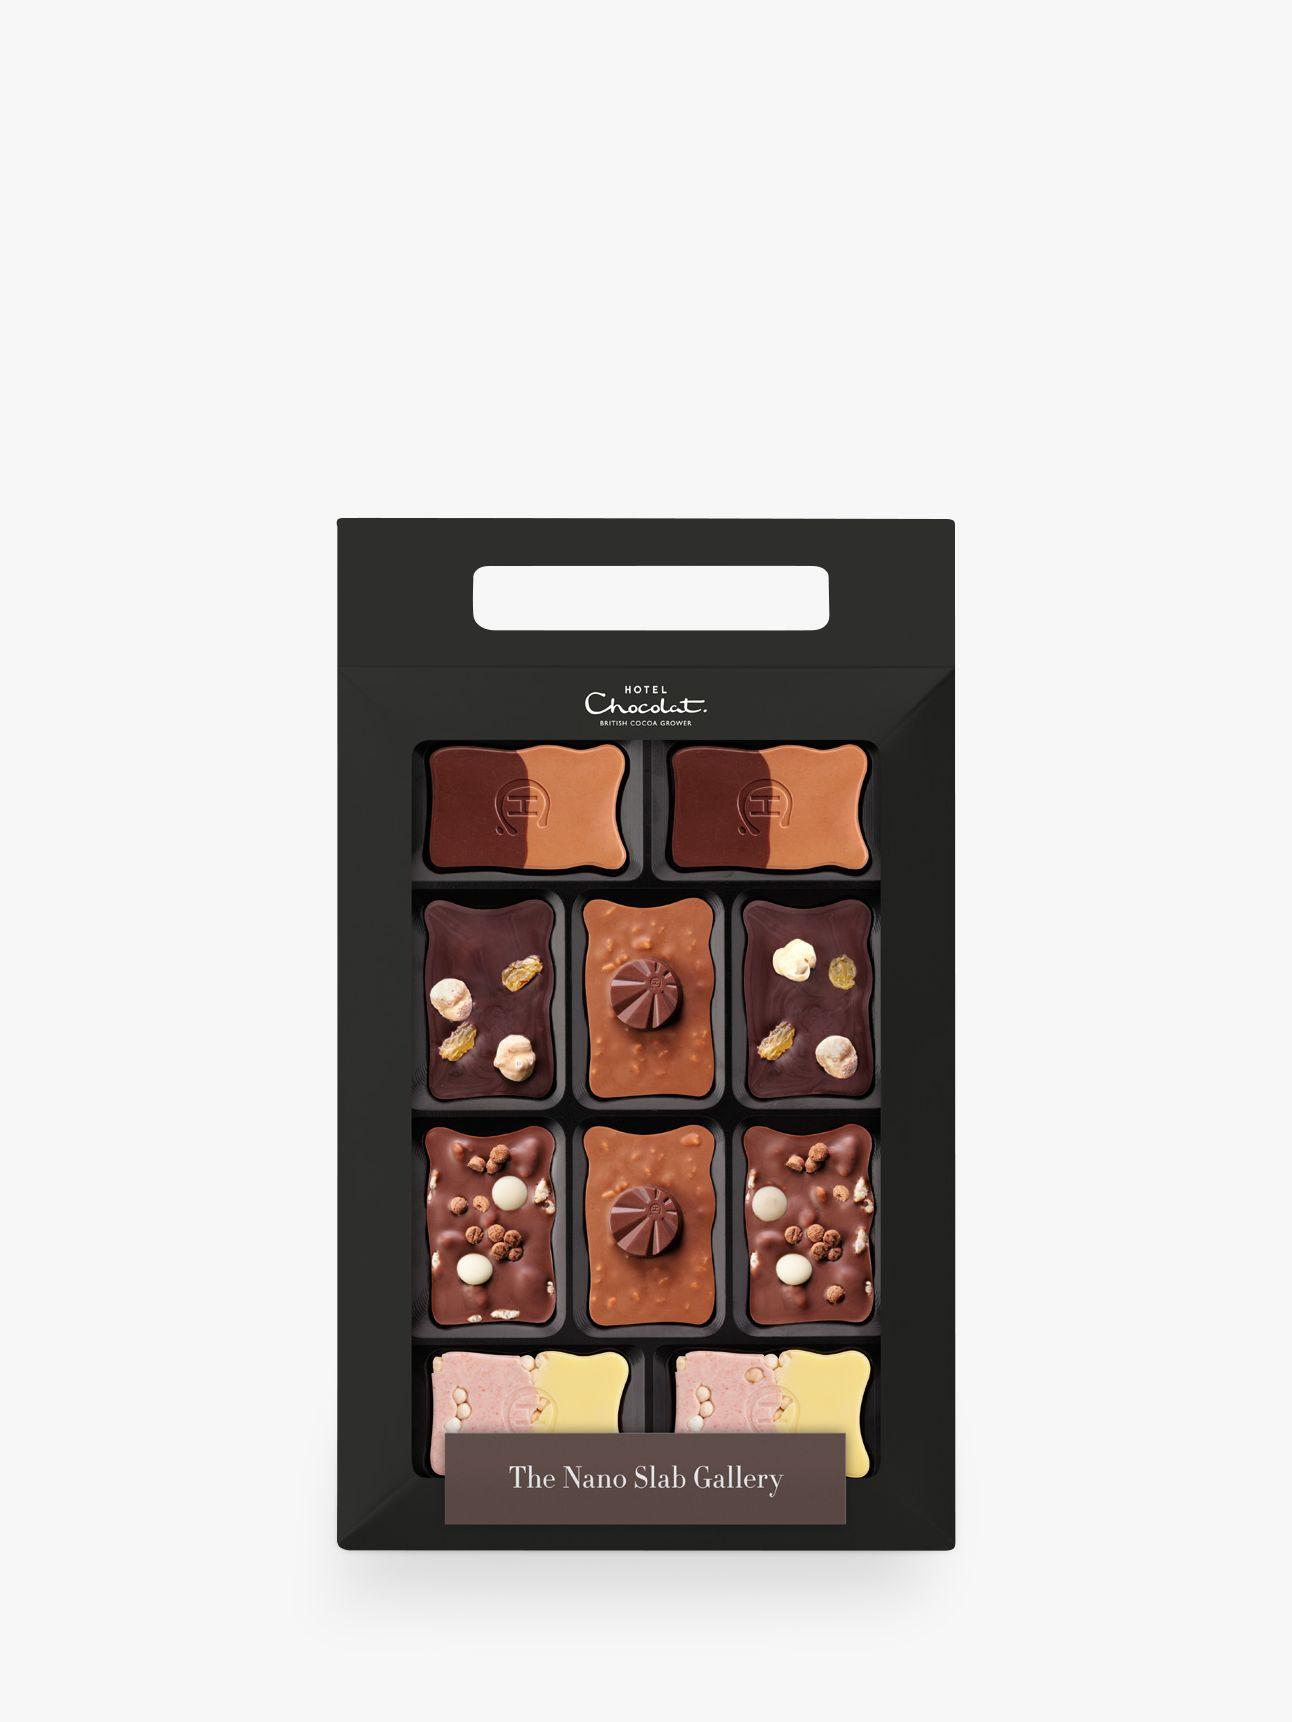 Hotel Chocolat Hotel Chocolat The Nano Slab Gallery, 160g